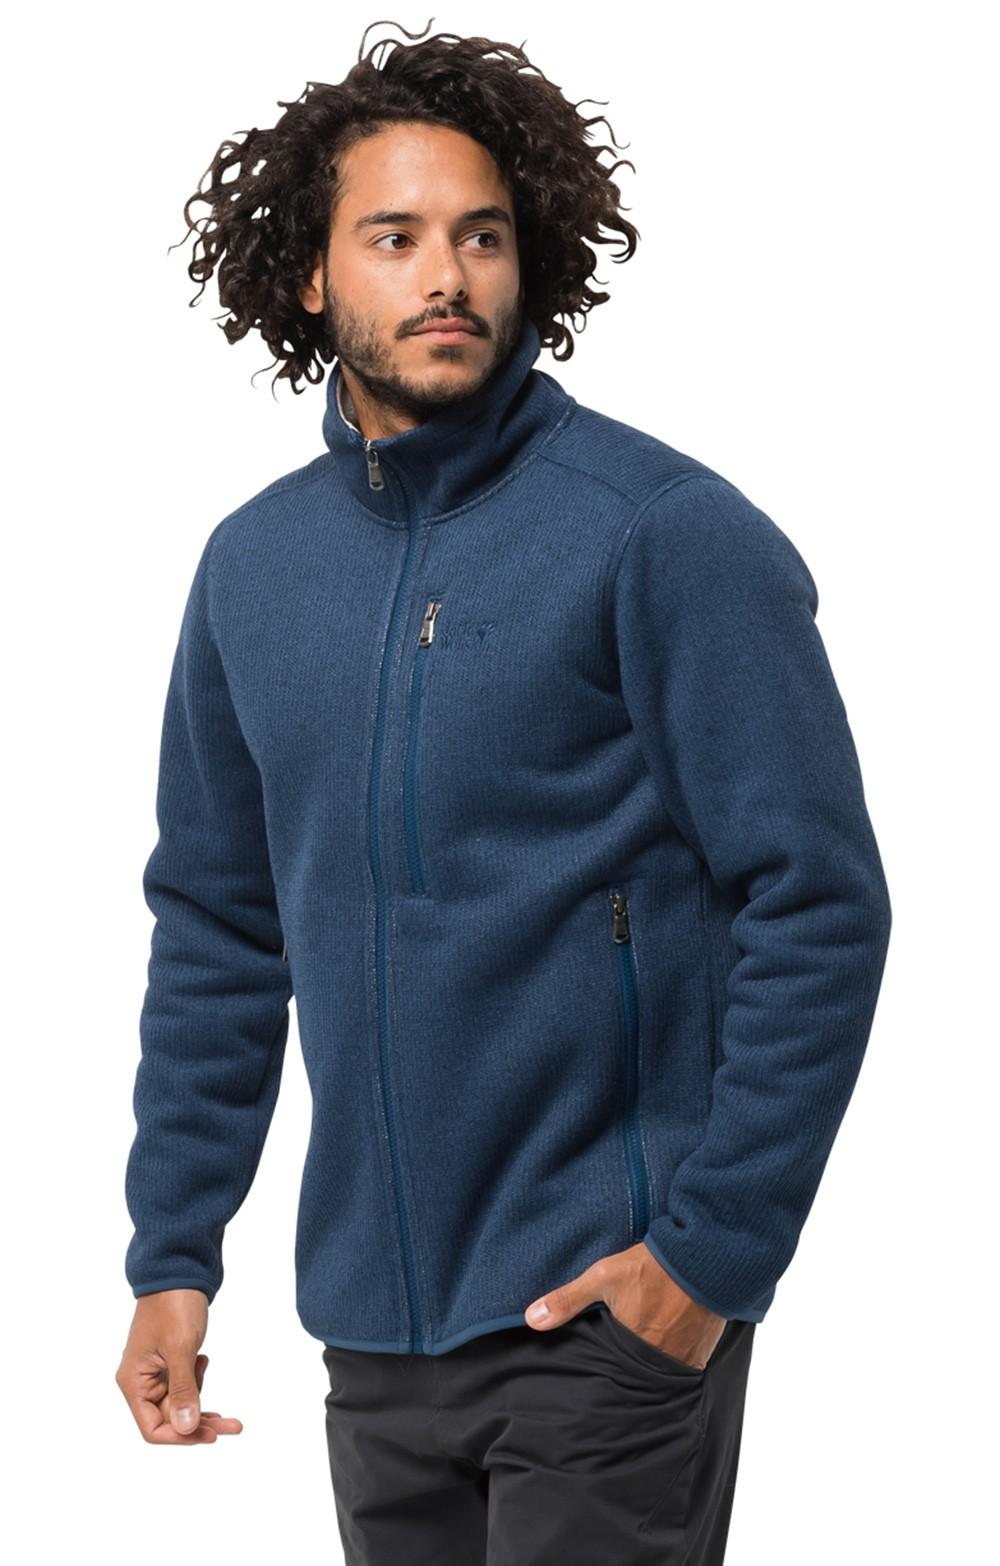 dc93098ae6 Men's Jack Wolfskin Robson Fjord Knit Fleece Jacket - House of Bruar